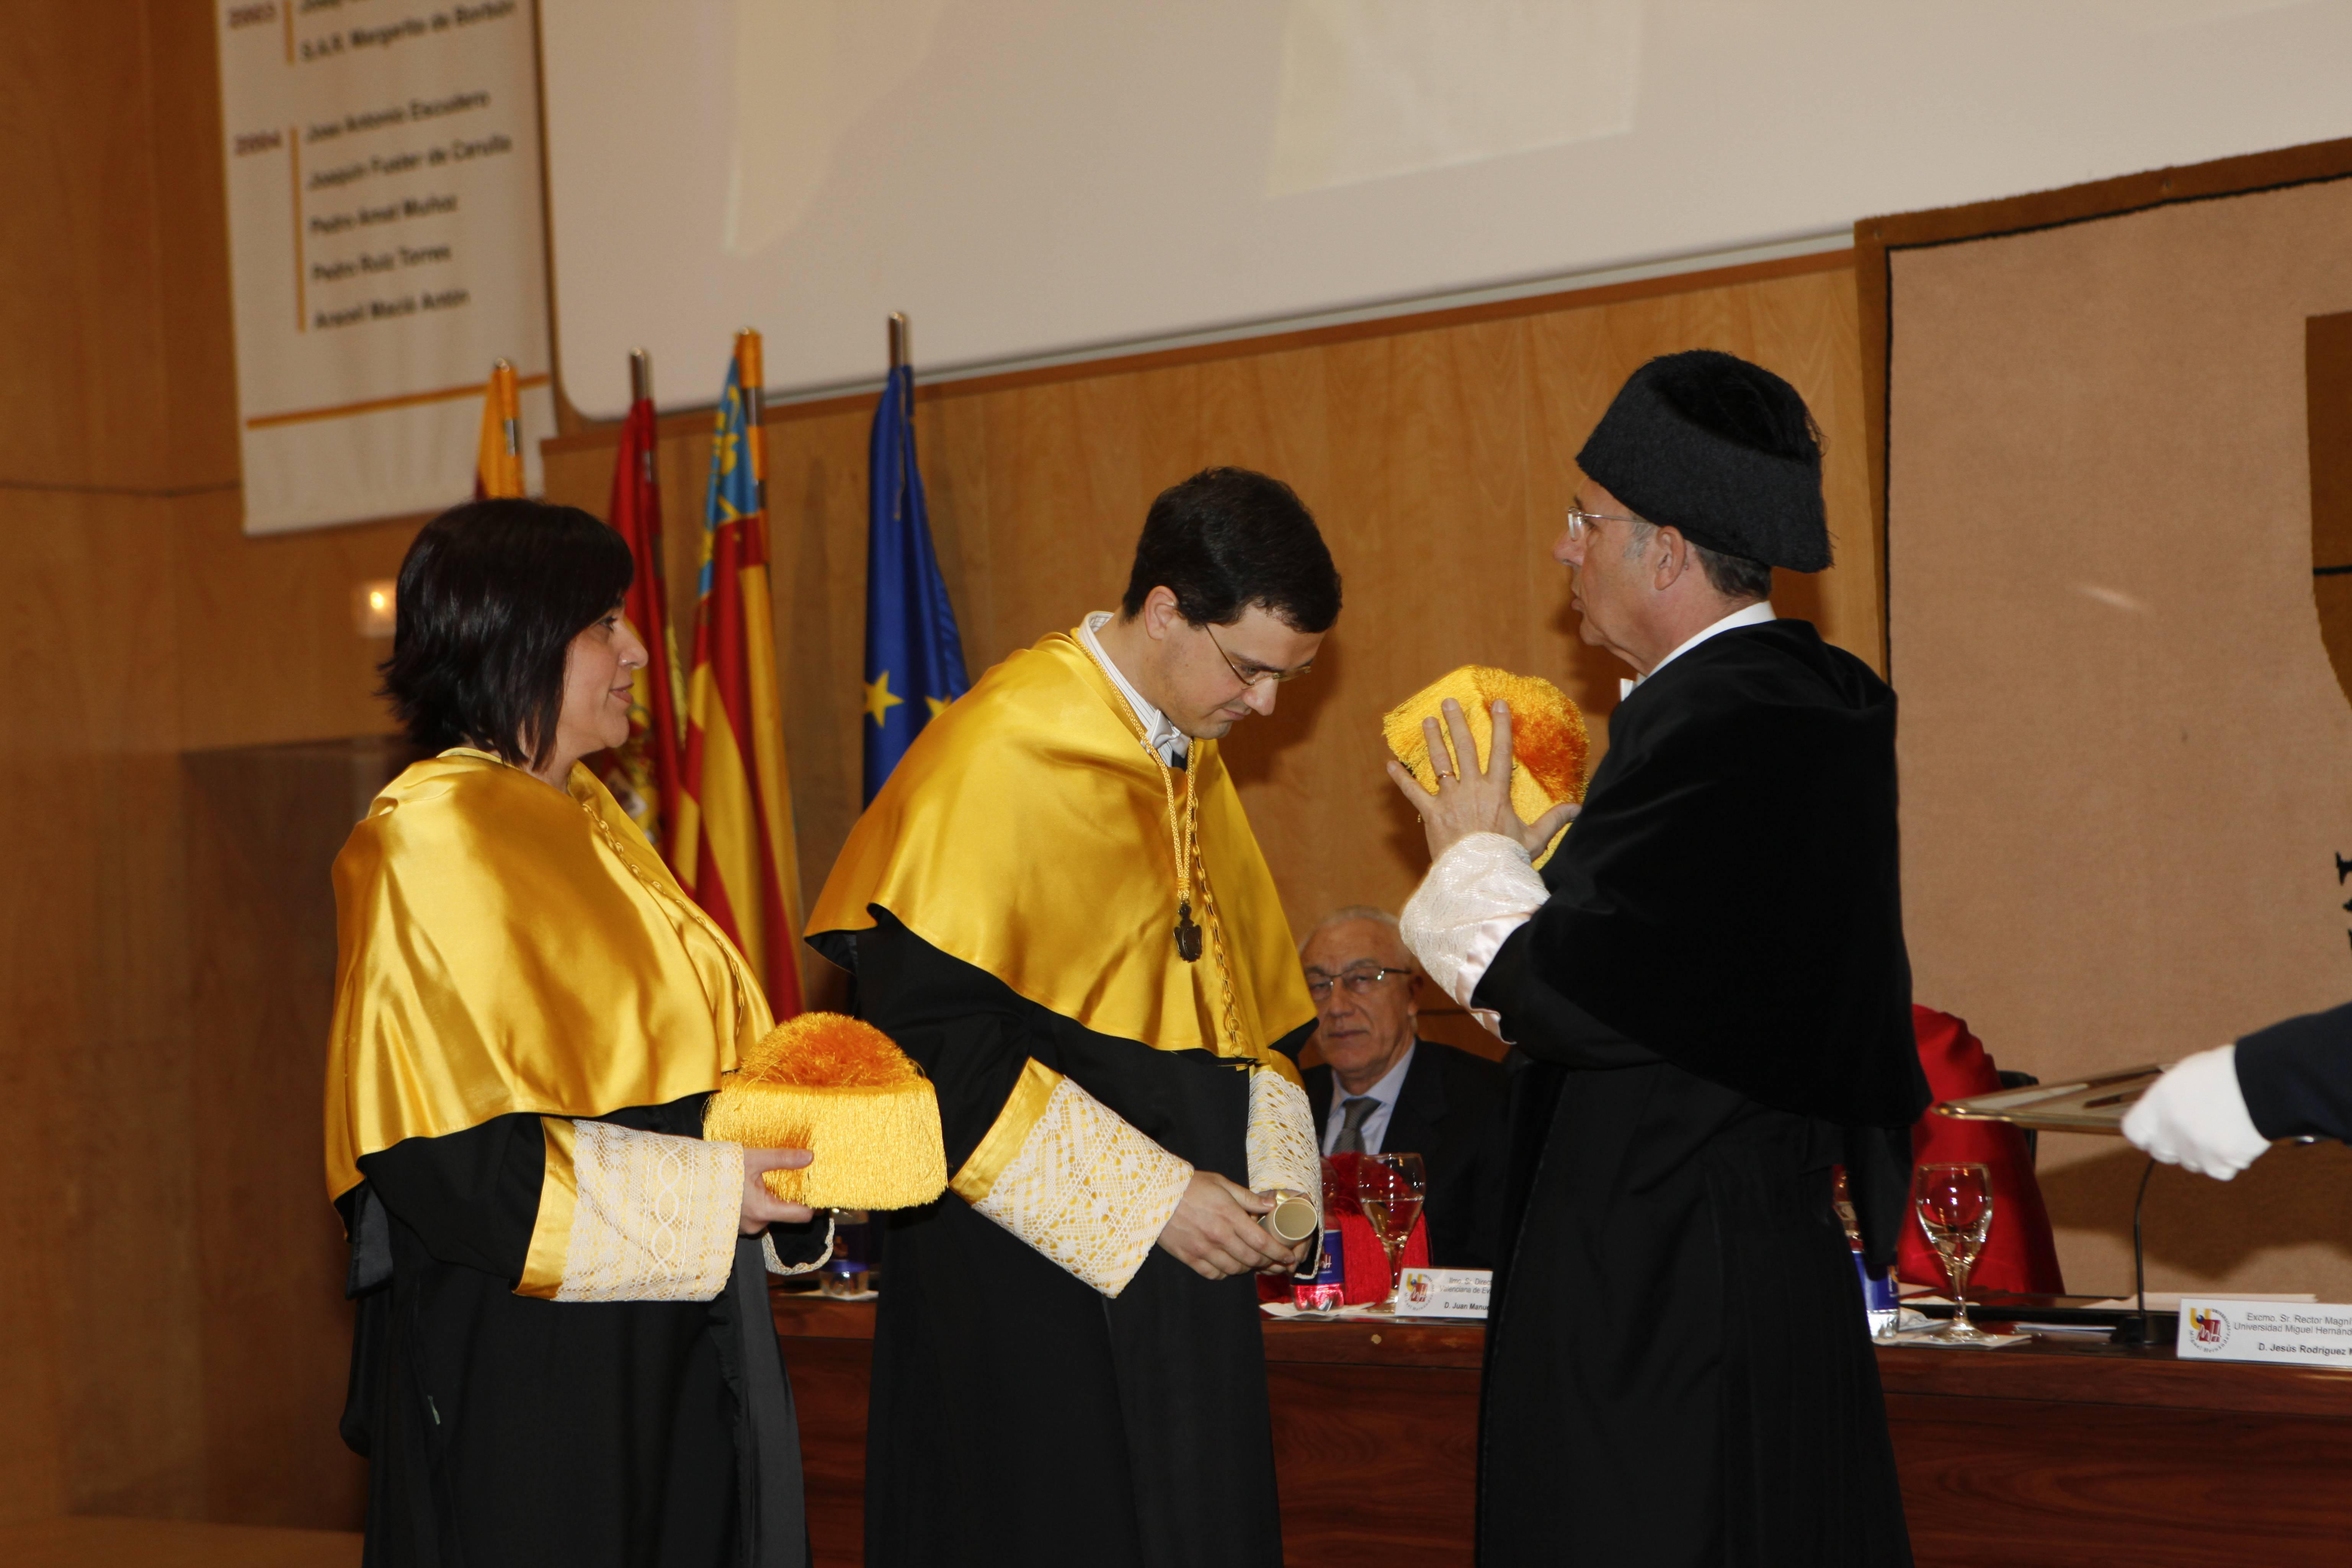 doctor-honoris-causa-luis-gamir_mg_1168.jpg